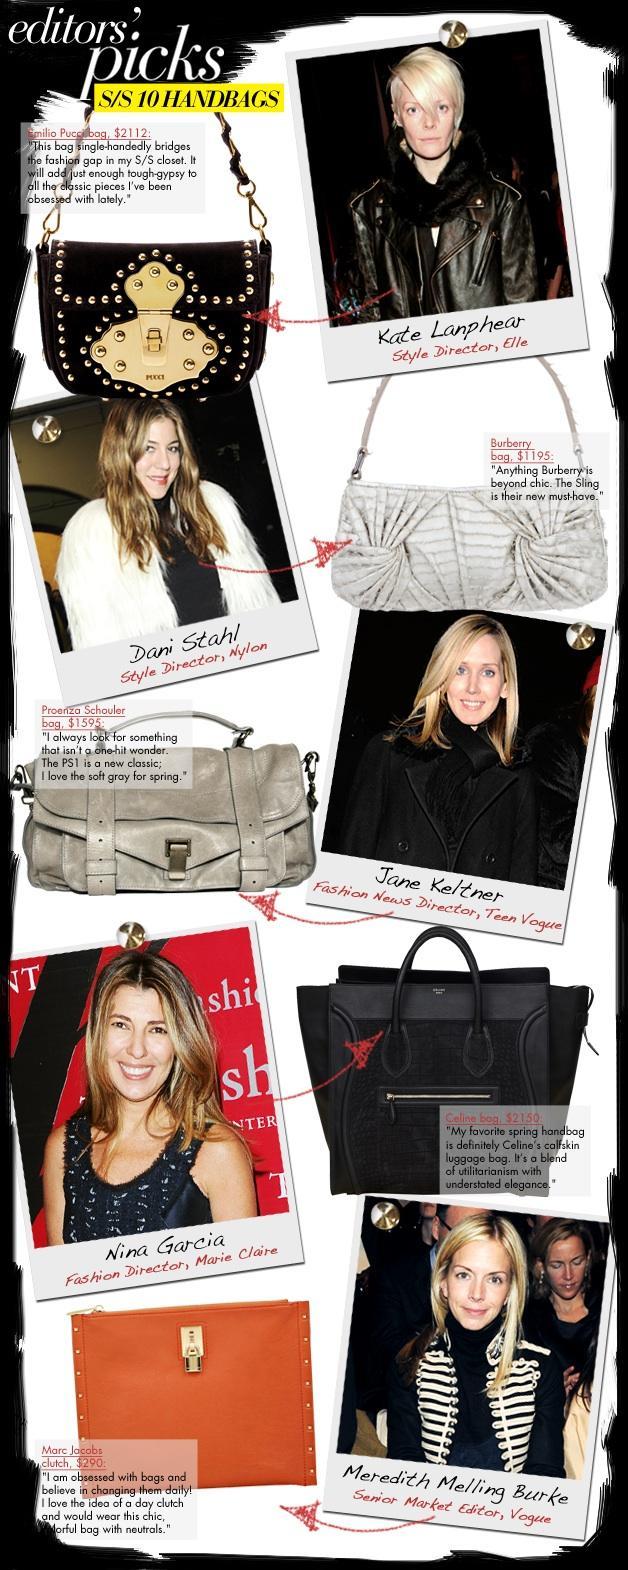 S/S 10 Handbags